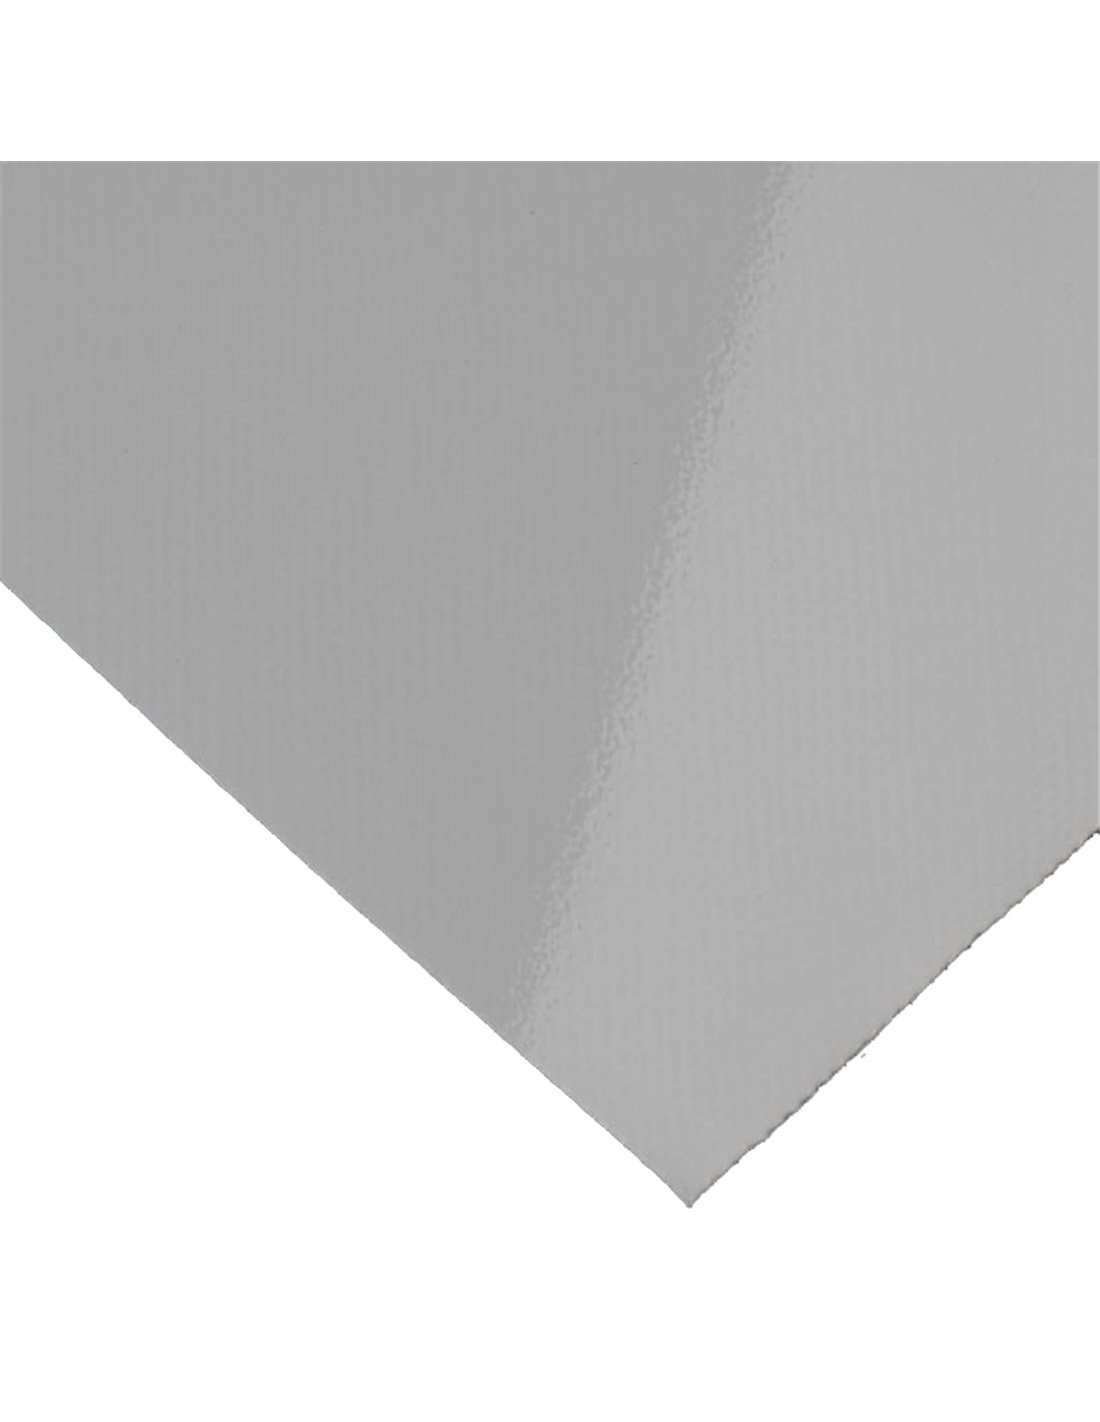 Lona de PVC de 2,5m ancho Rollo